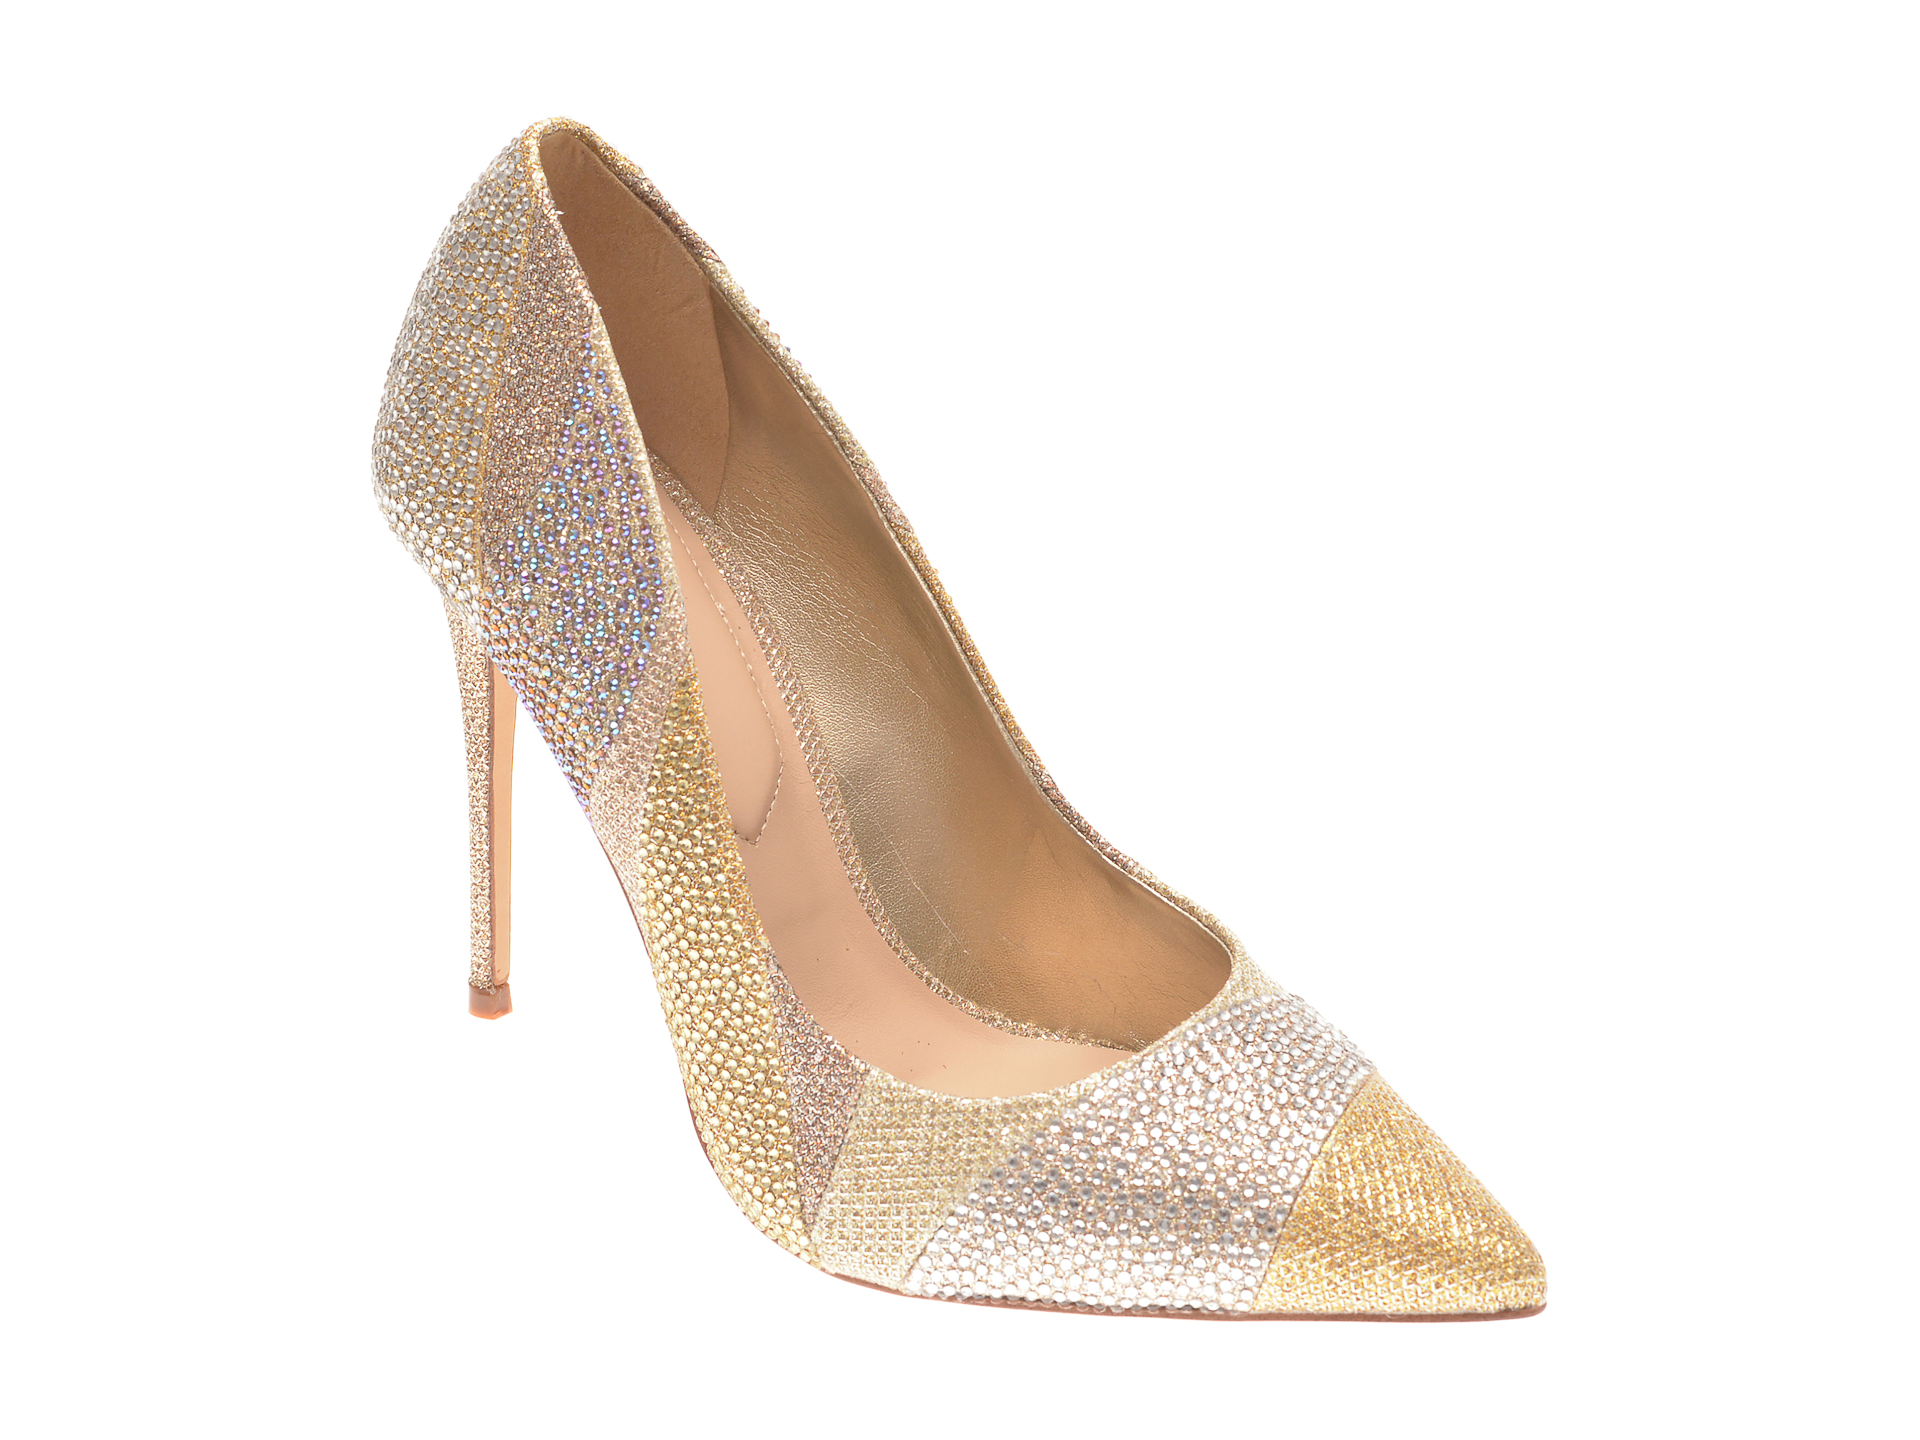 Pantofi ALDO aurii, Kalimna711, din material textil imagine